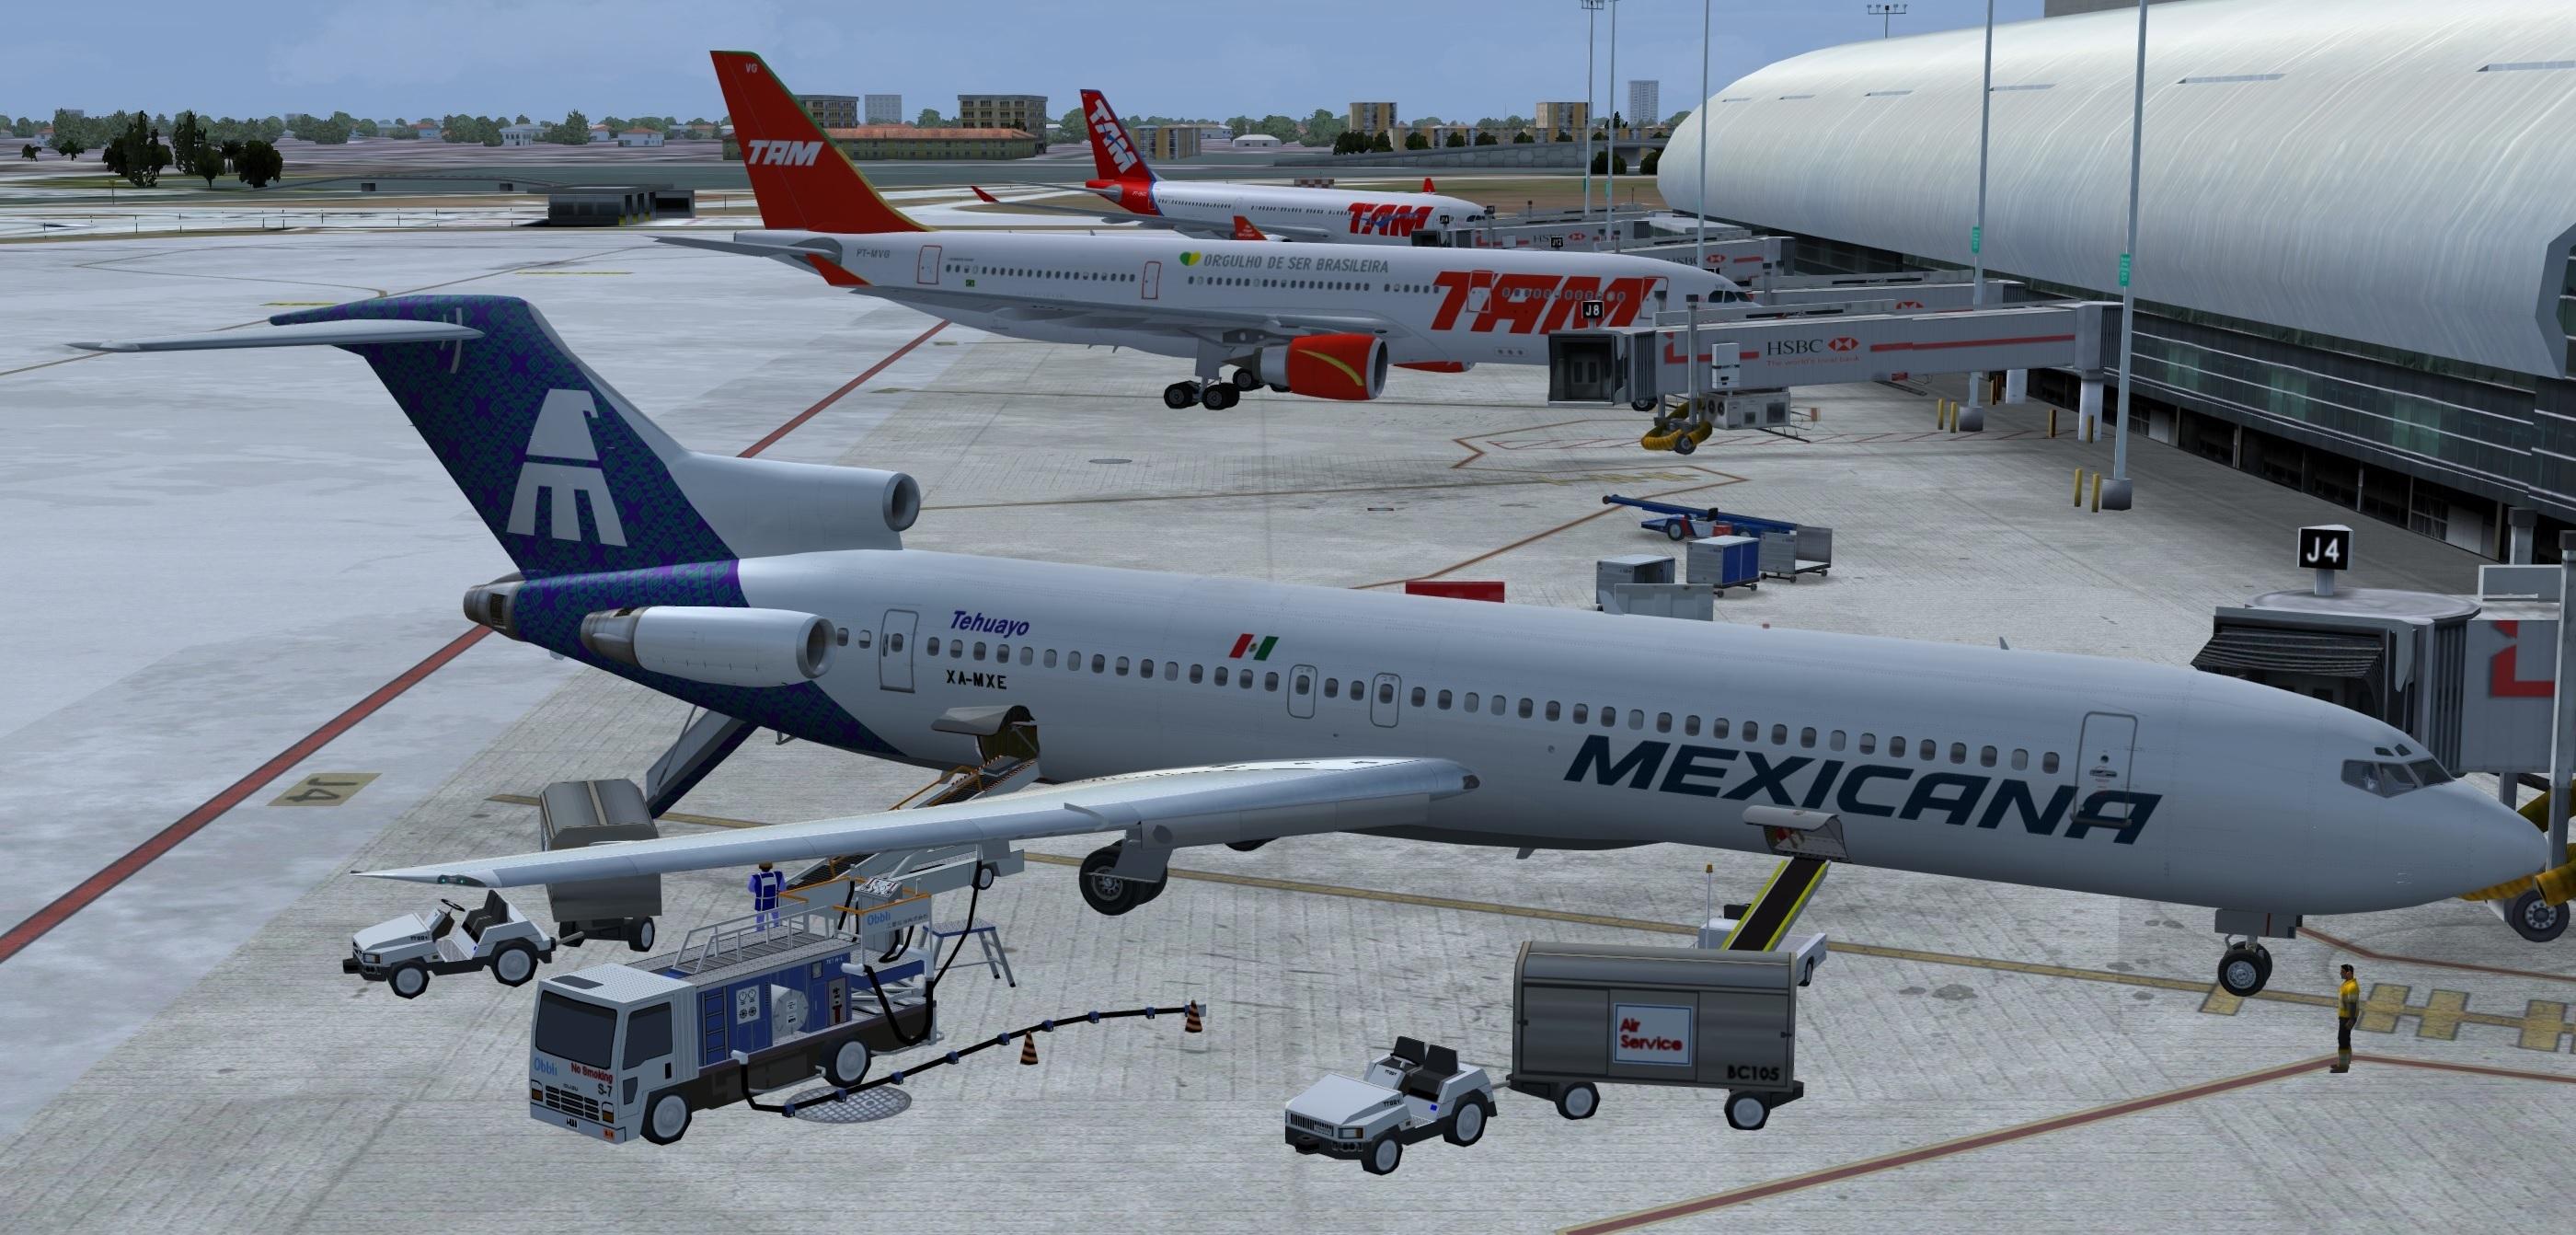 mexicana_boeing_727-2yajc0.jpg